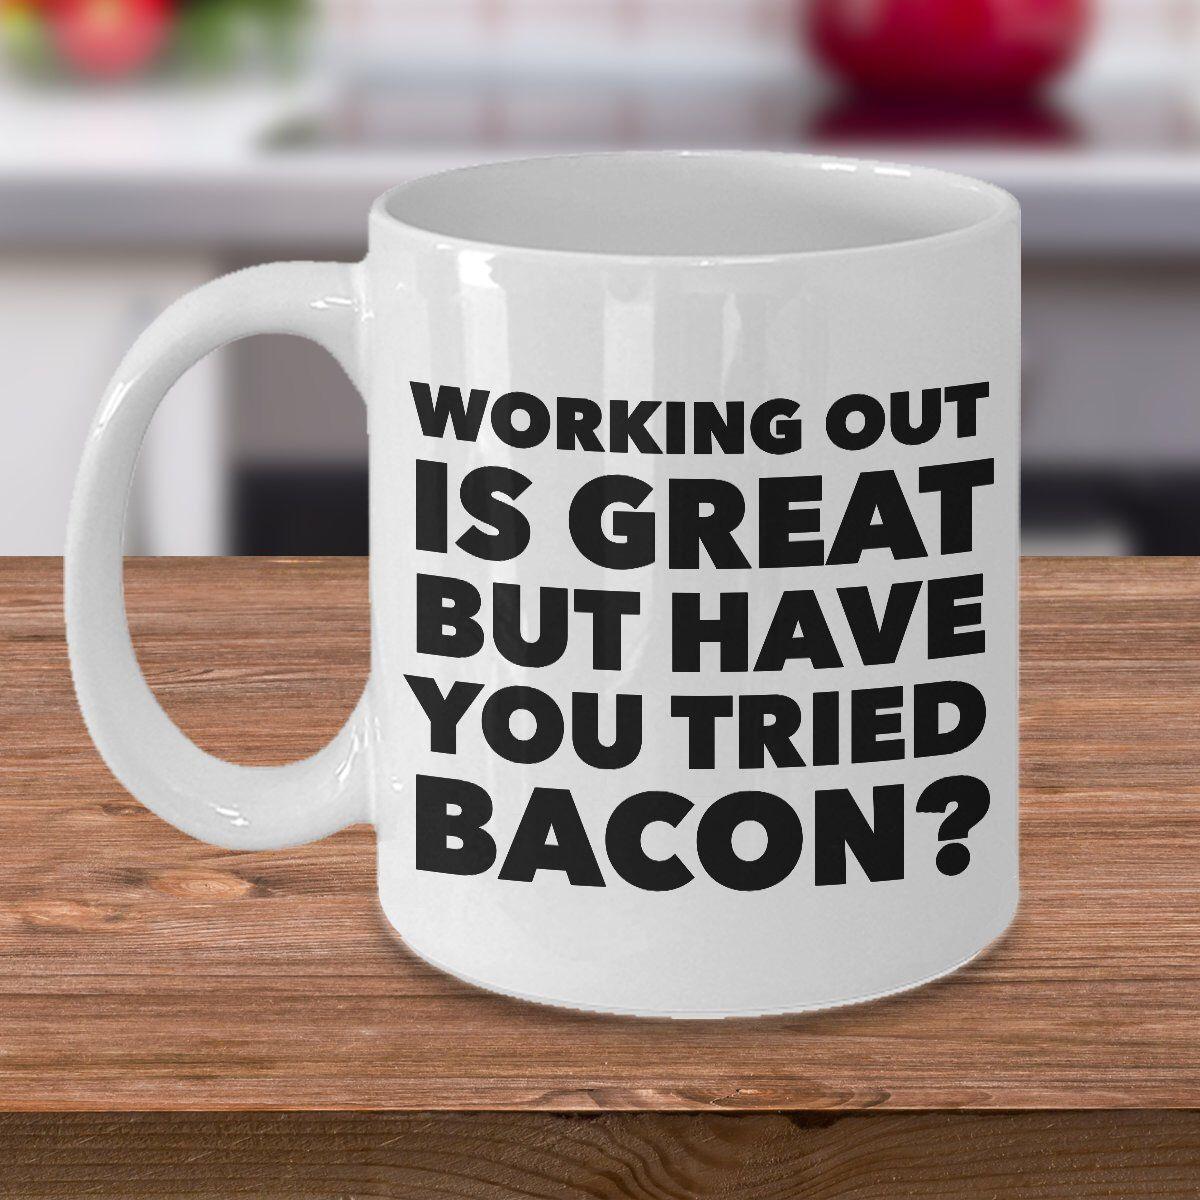 Bacon Mug Bacon Gifts Bacon Coffee Mug Working Out is